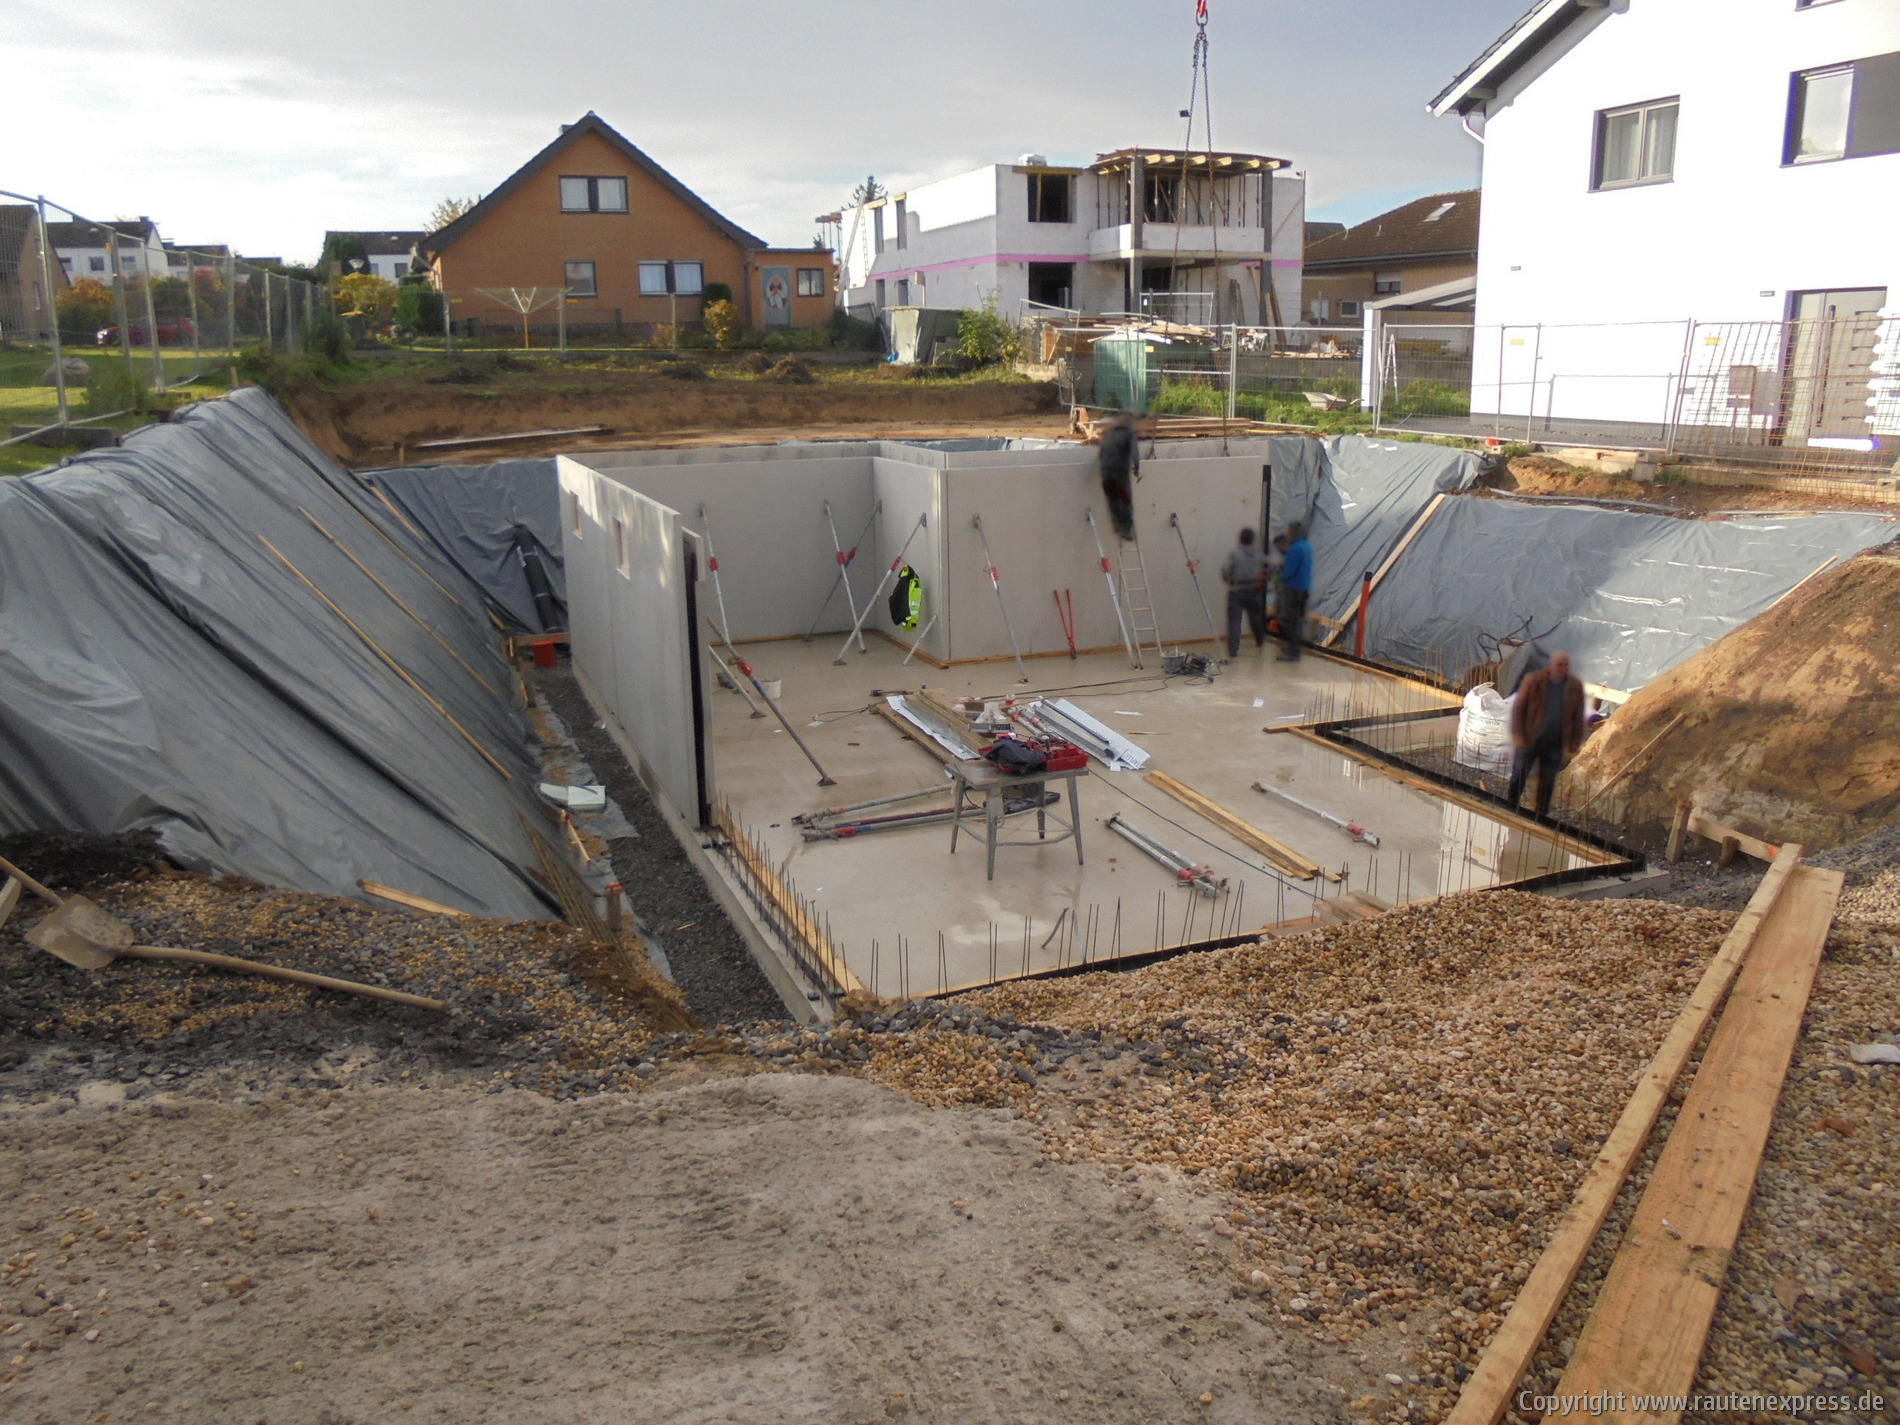 Kellerwände werden geliefert | artos-haus.de Bild 2